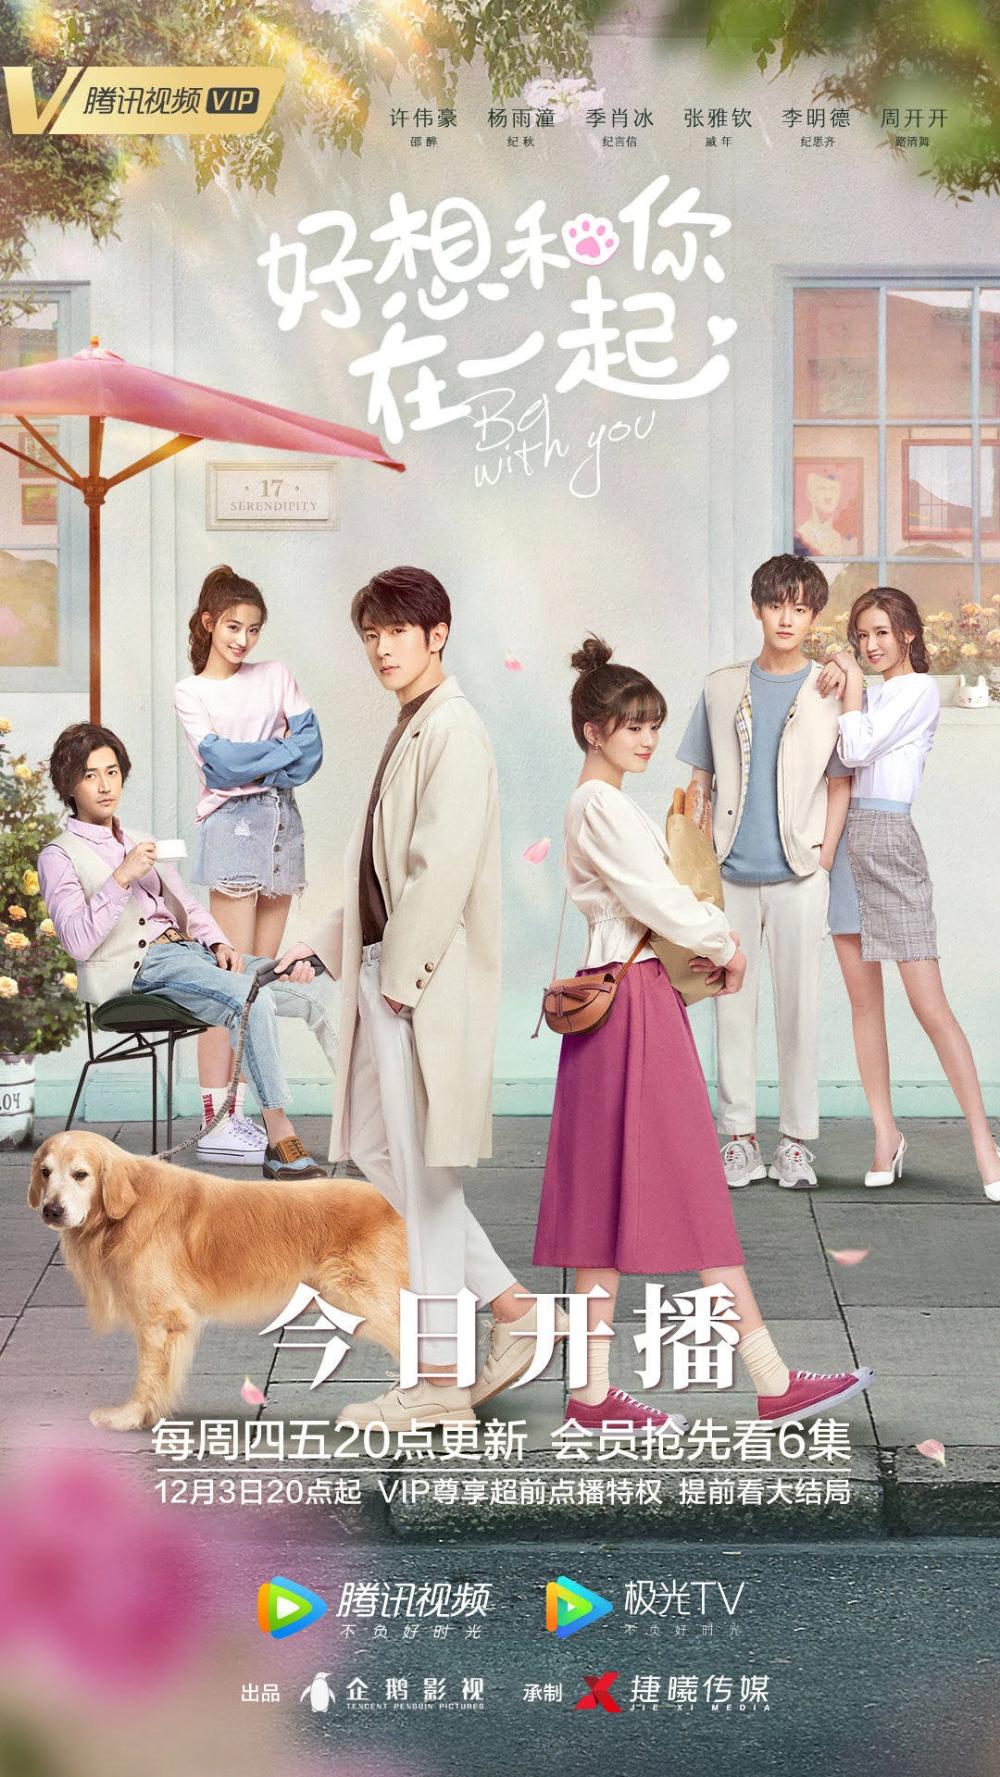 Ver Dorama Be With You Sub Español Descargar Be With You Online Gratis With You Chinese Drama Korean Drama List Japanese Drama